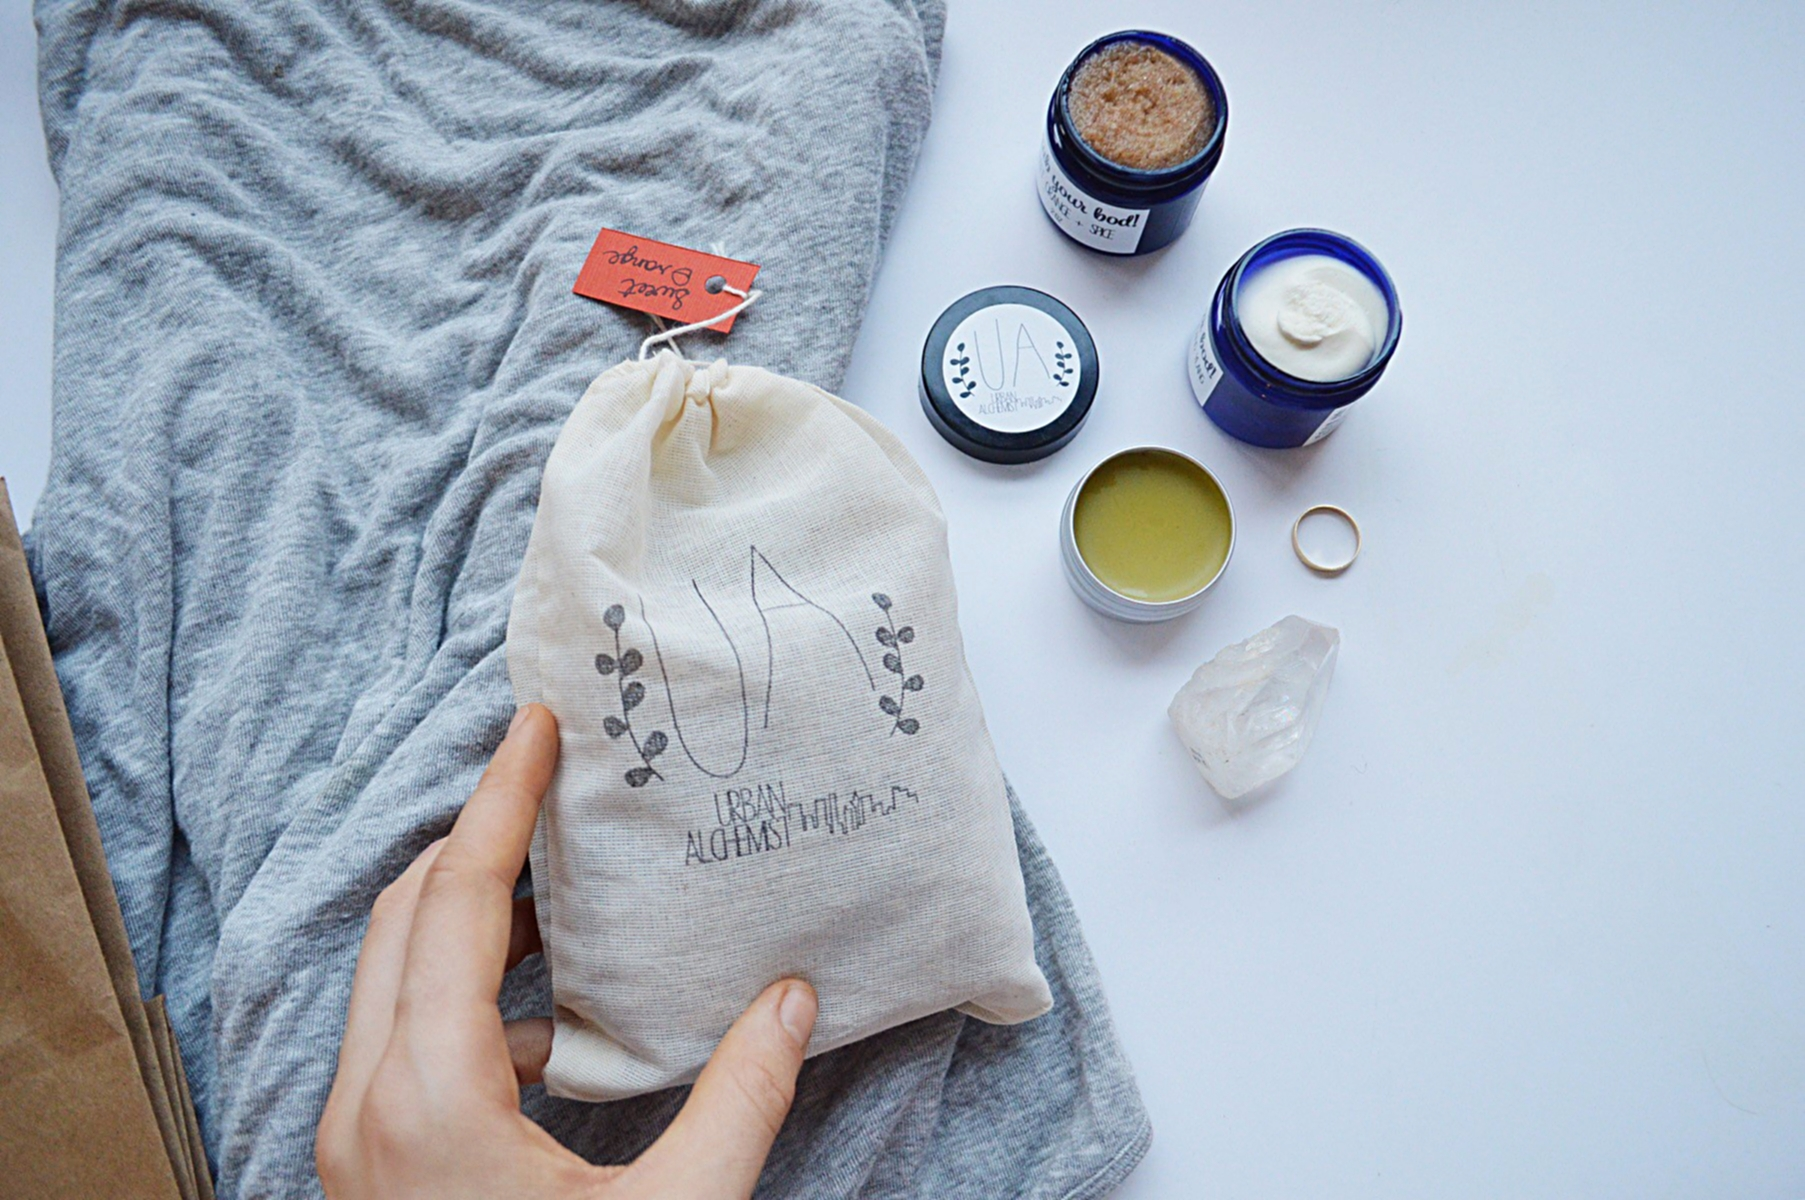 Urban Alchemist Sweet Orange Holiday Gift Set Review + Giveaway